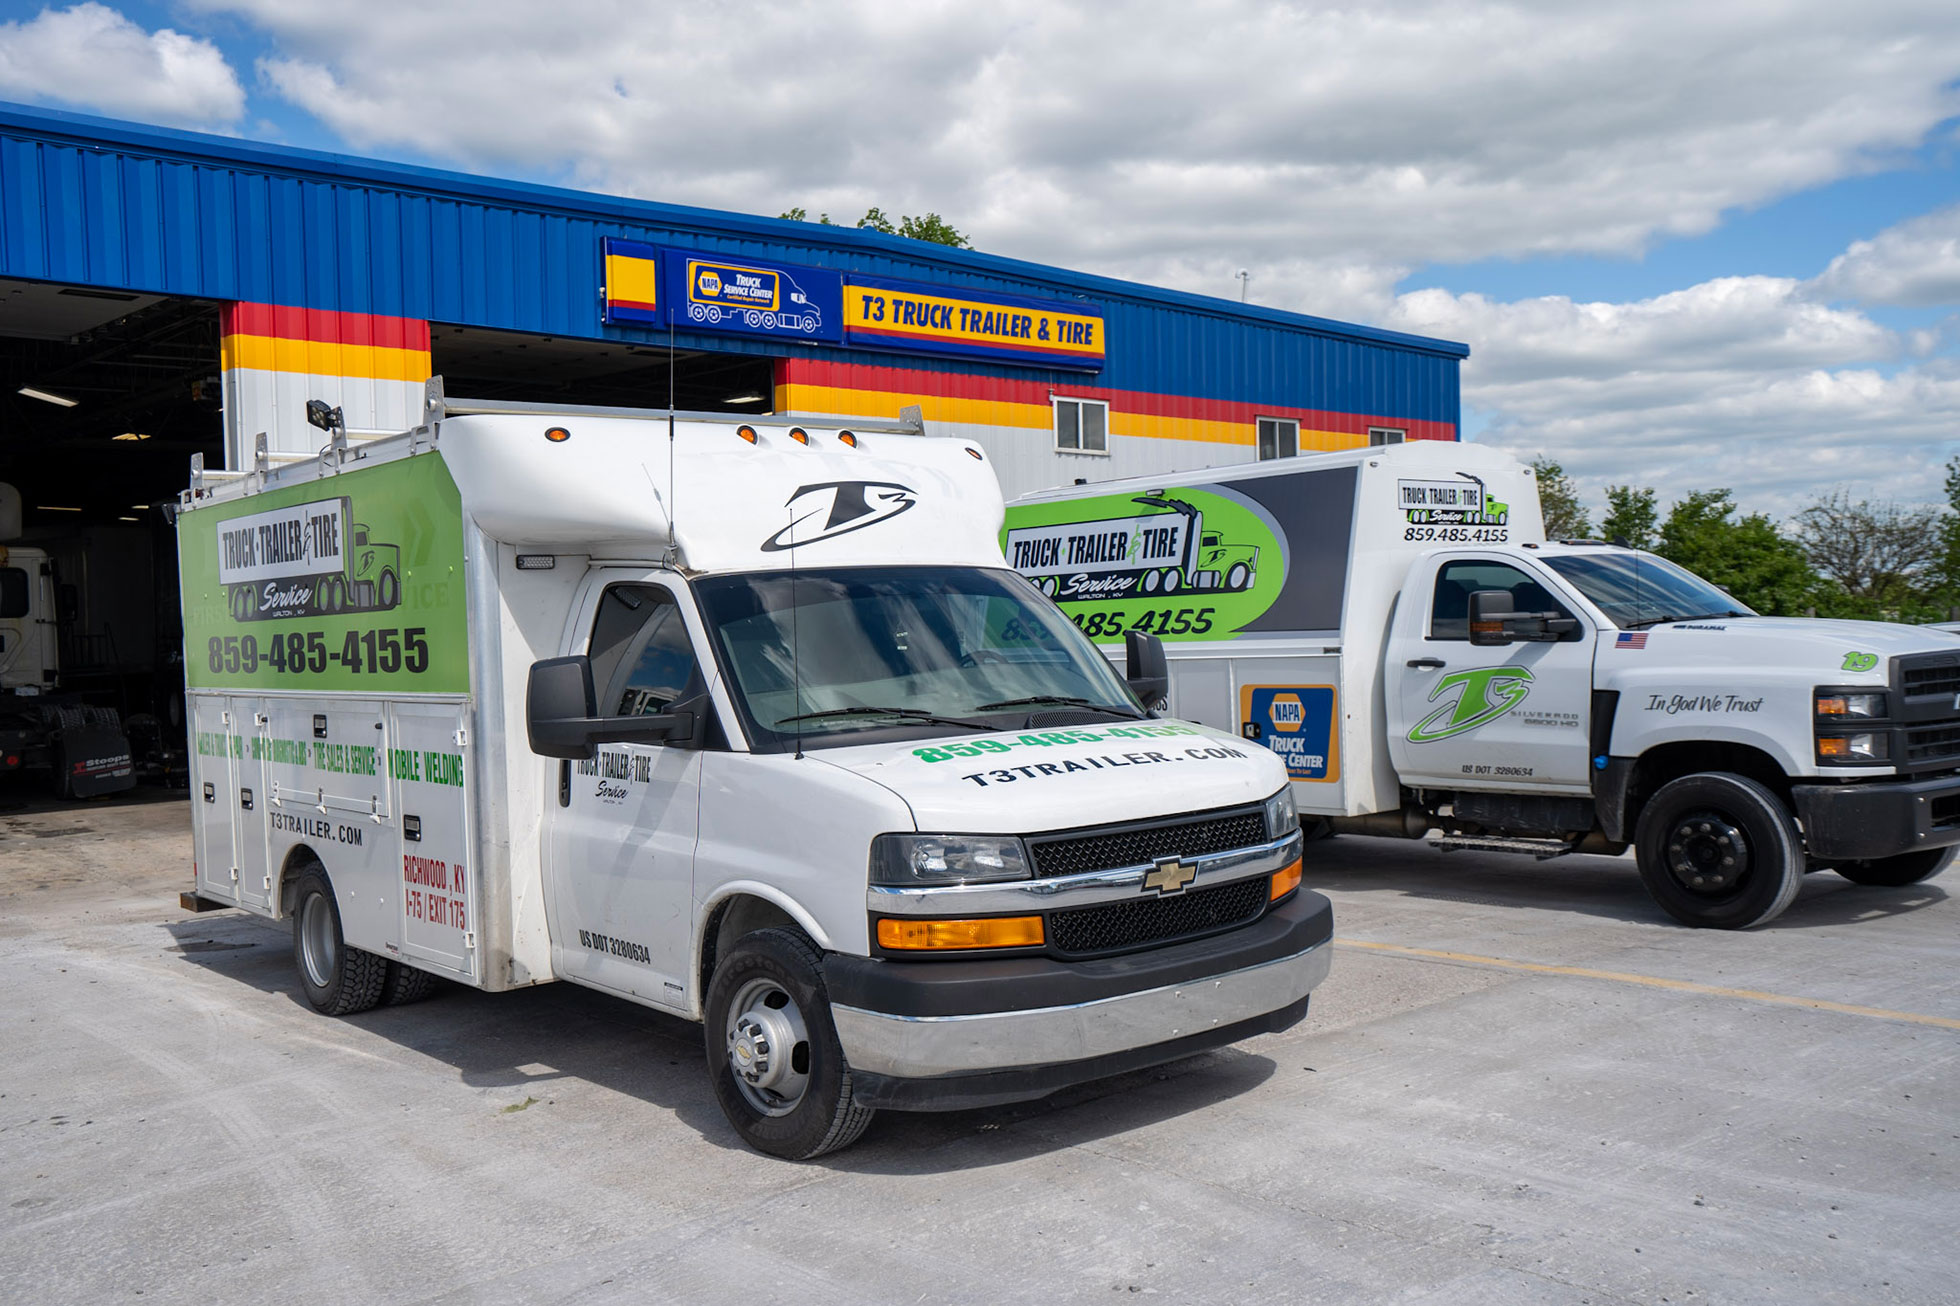 Mobile Truck Service